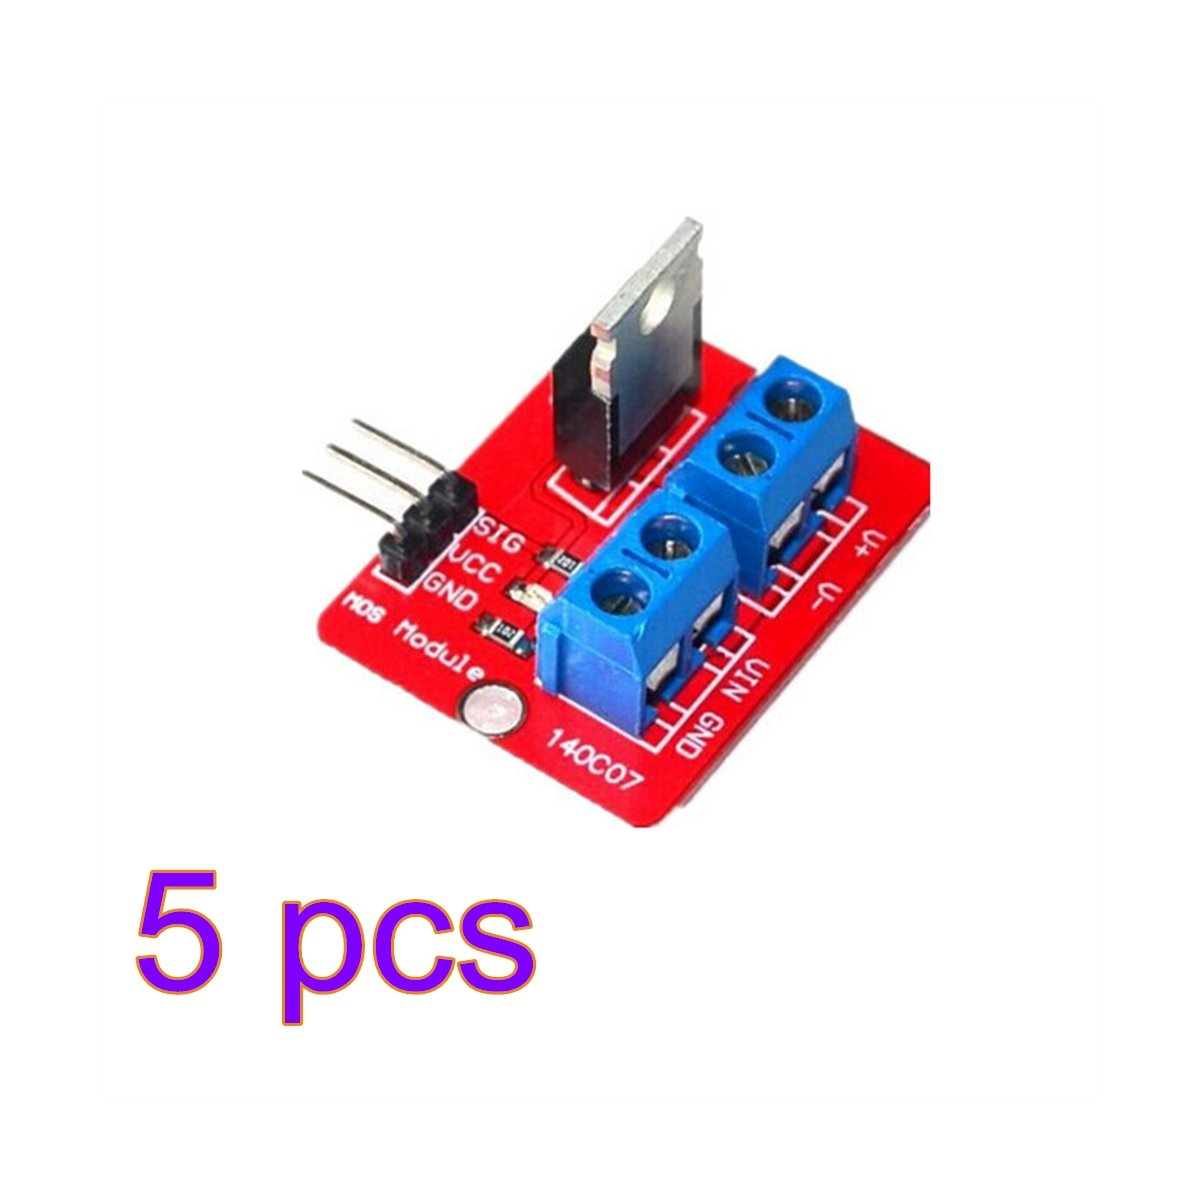 Kentop, IRF520, modulo driver MOSFET per transistor Arduino Raspberry ARM, Rosso 1, 5 pezzi